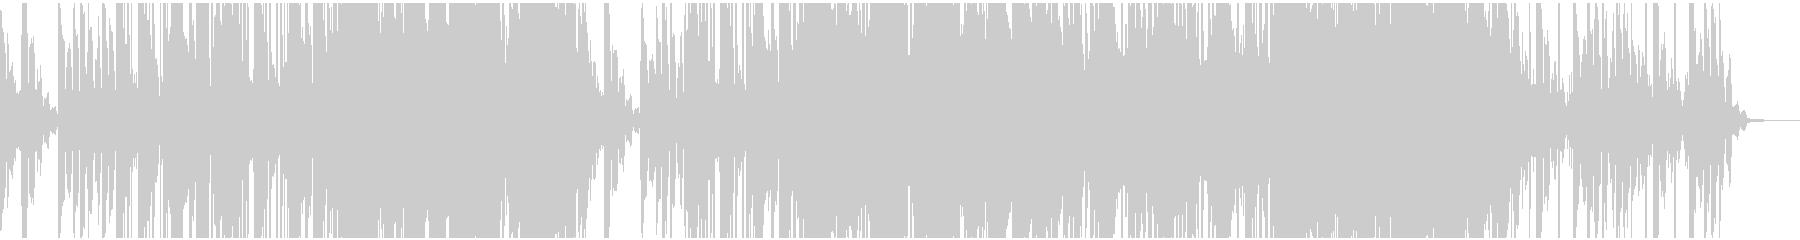 TRAP R&B クールなサウンドの未再生の波形